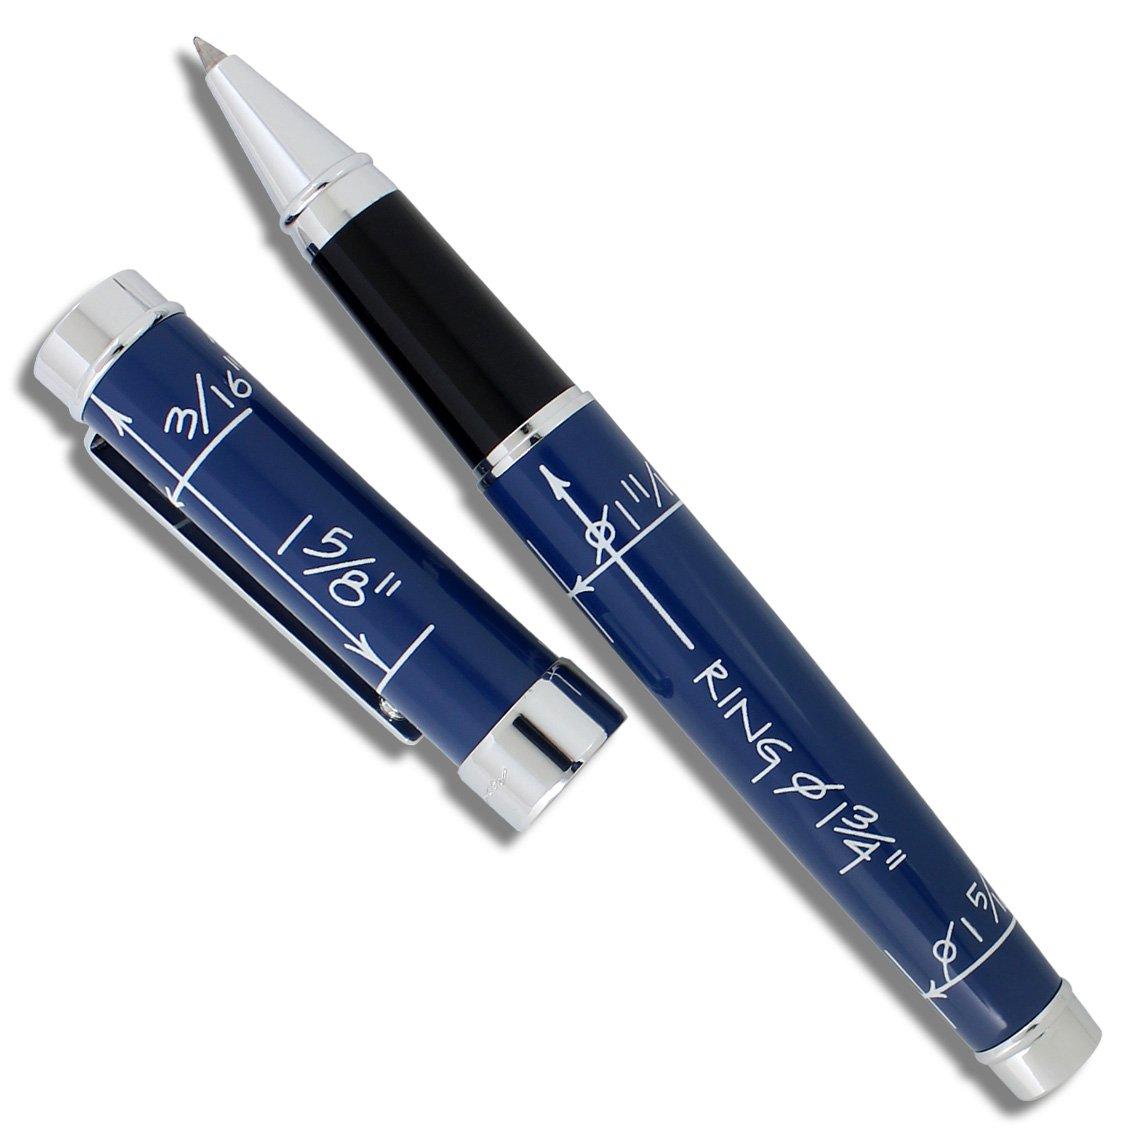 ACME Studios Blueprint Roller Ball Pen by Constantin Boym (PCB01R) by ACME Studios Inc